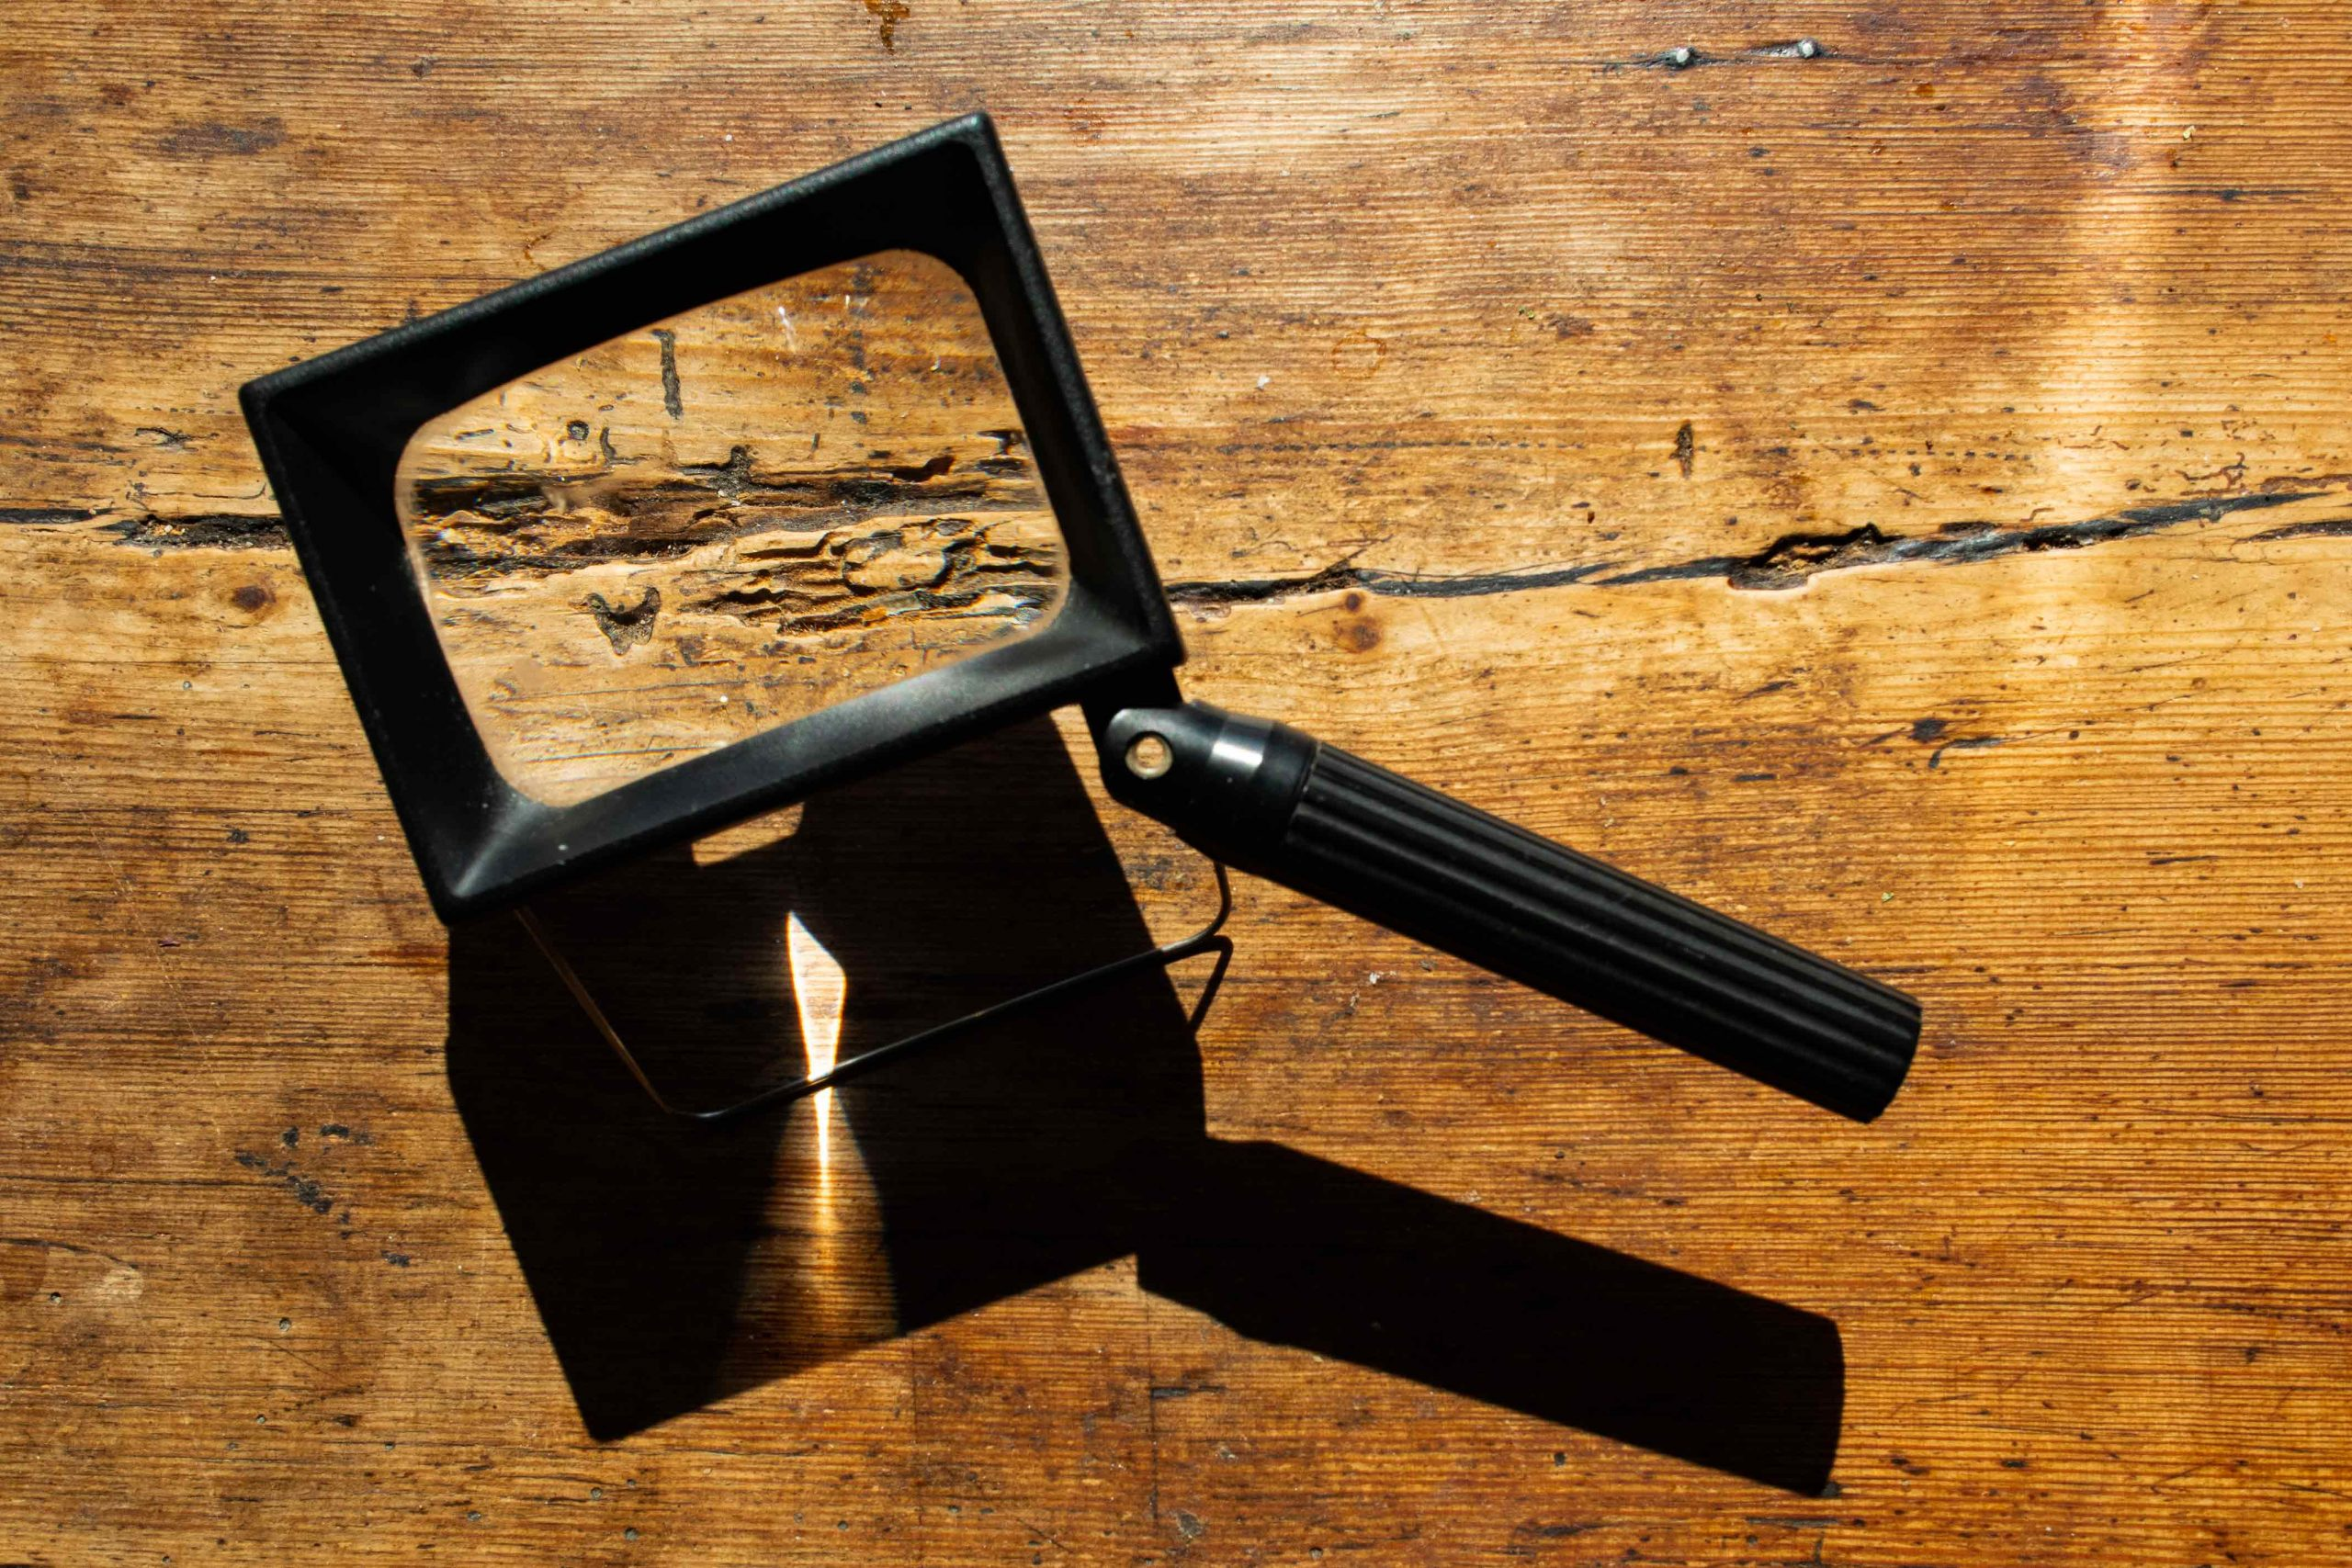 Struktur der Holzplatte unter der Lupe